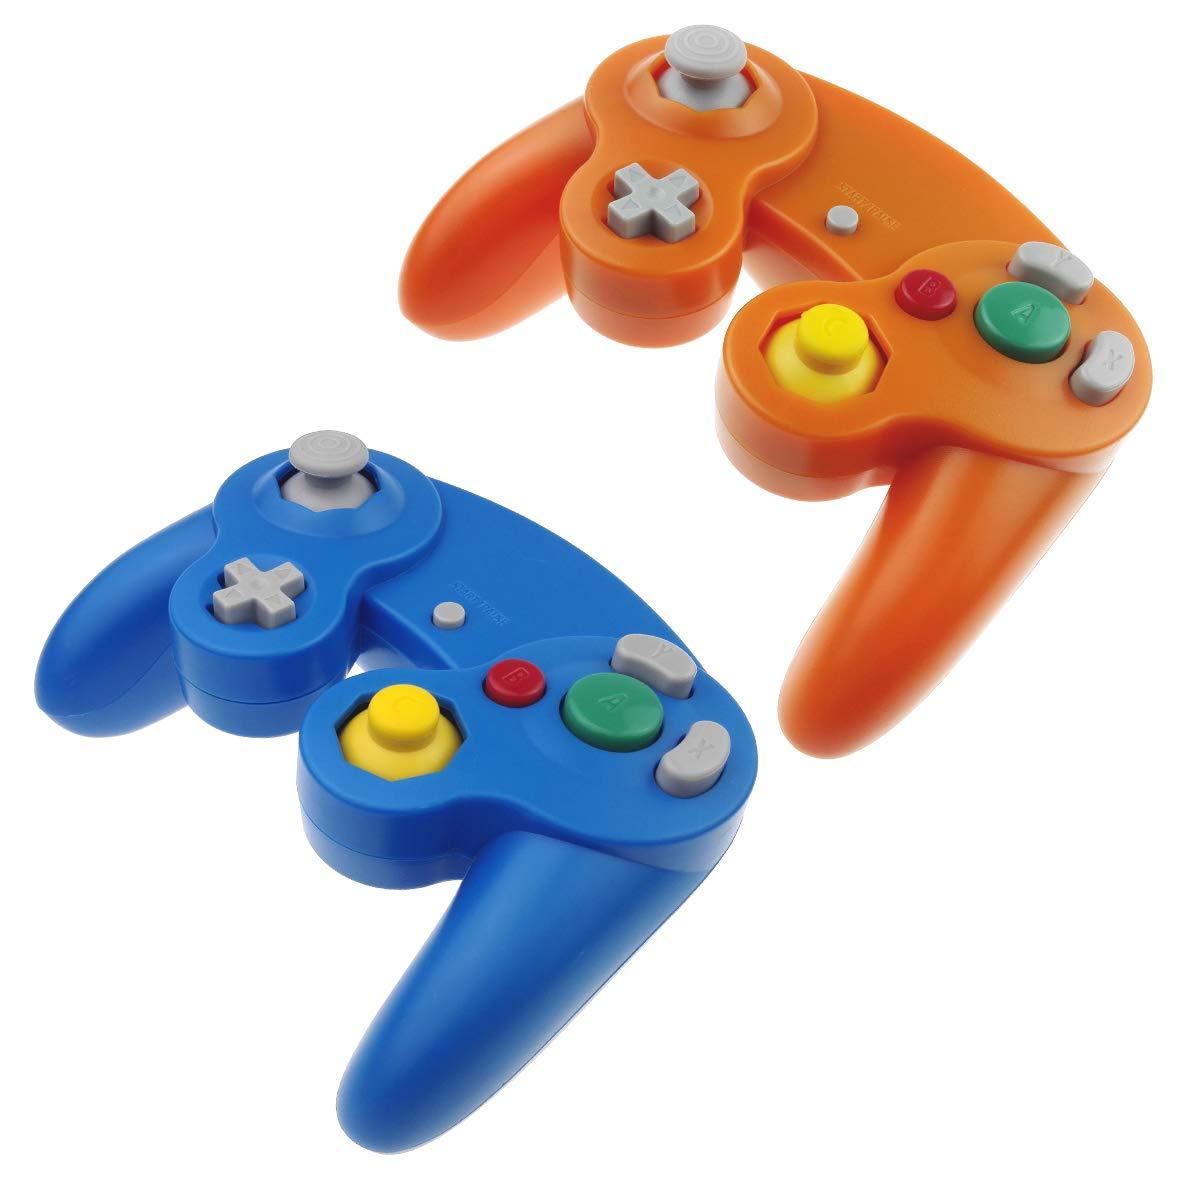 TechKen Nintendo Wii Controller GameCube Wii U Replacement Wired Classic Controller Gamepad for Nintendo GameCube Wii